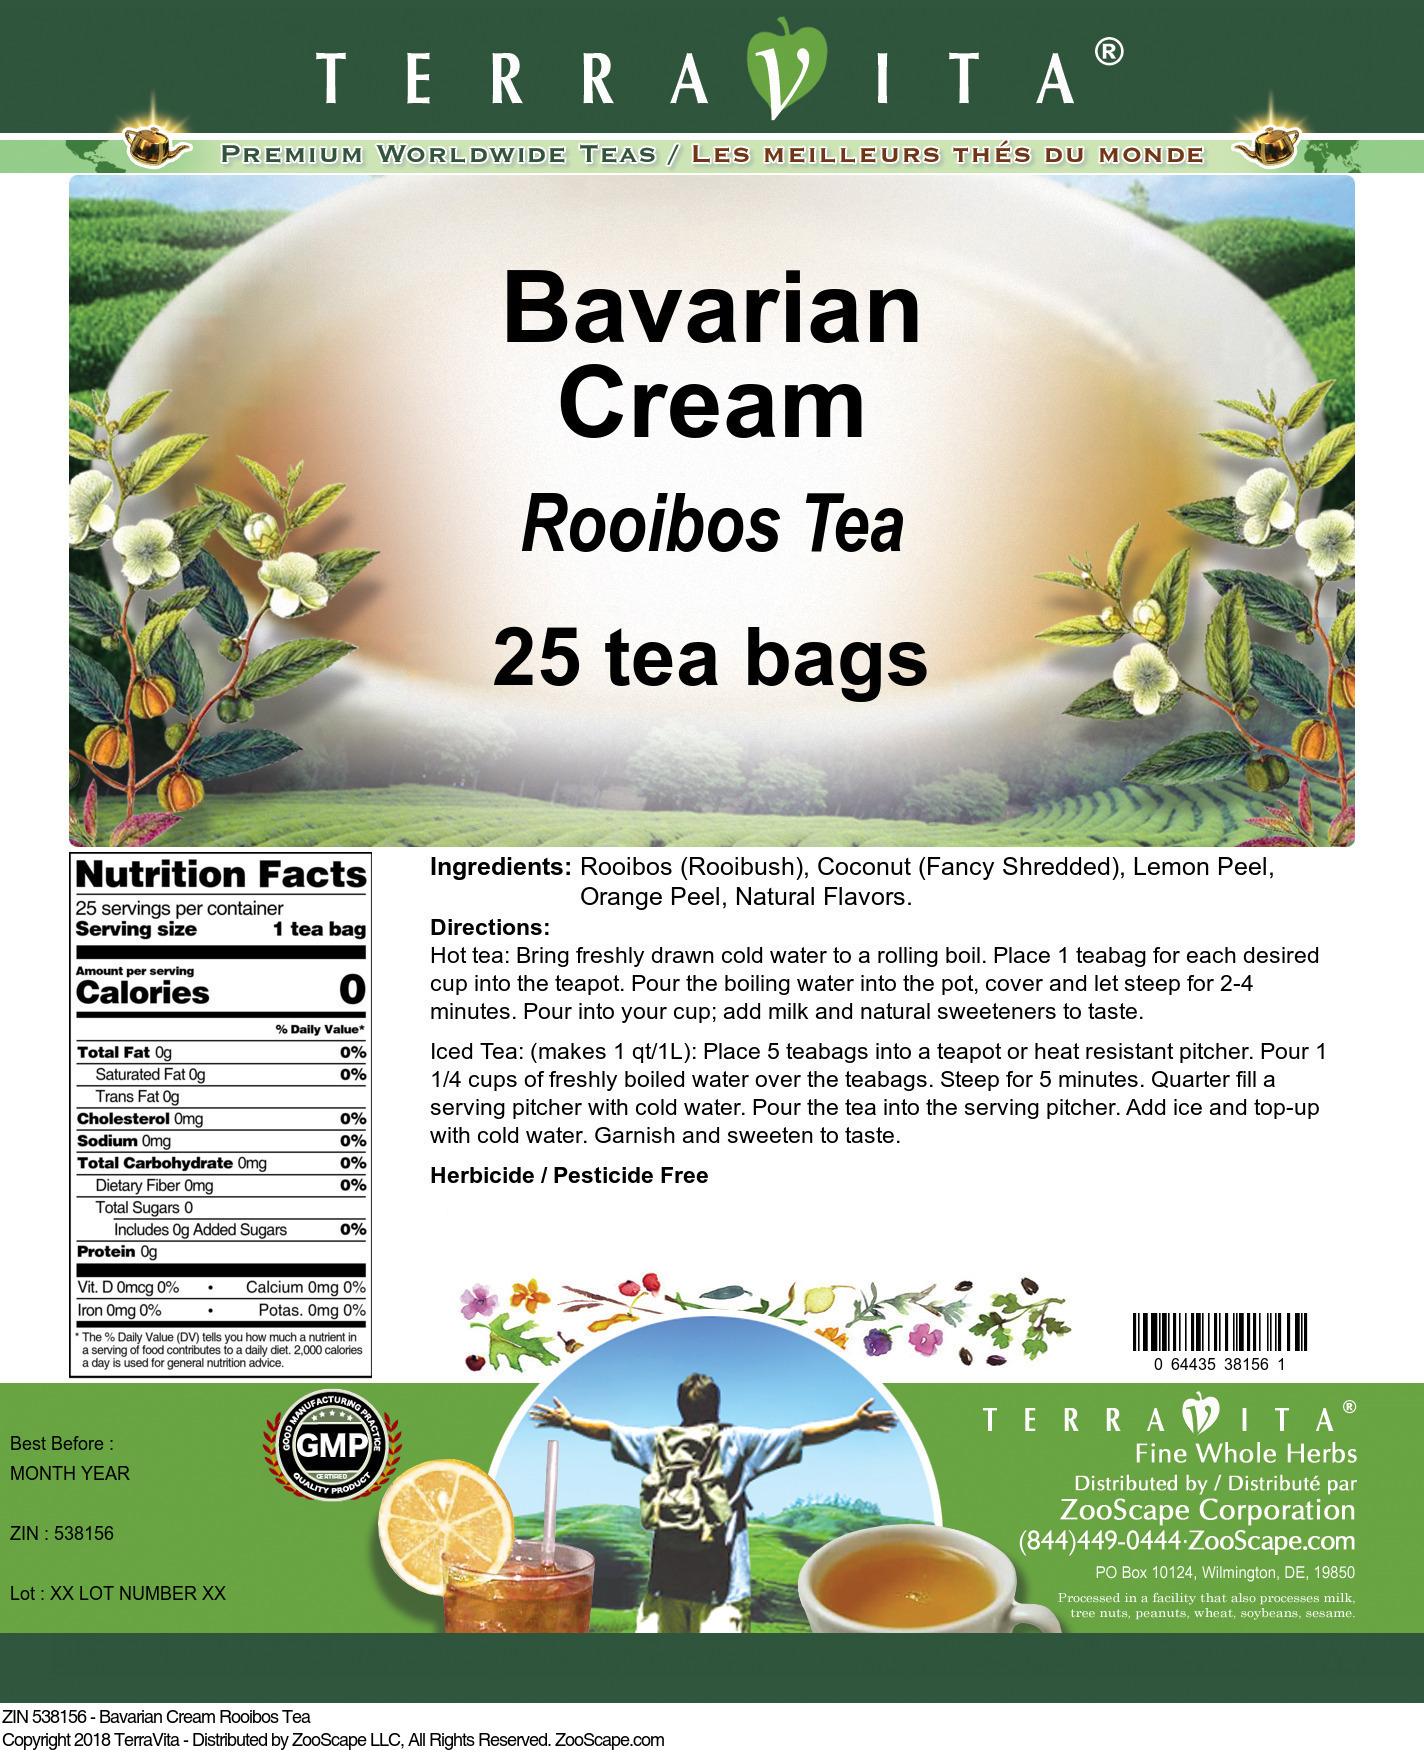 Bavarian Cream Rooibos Tea